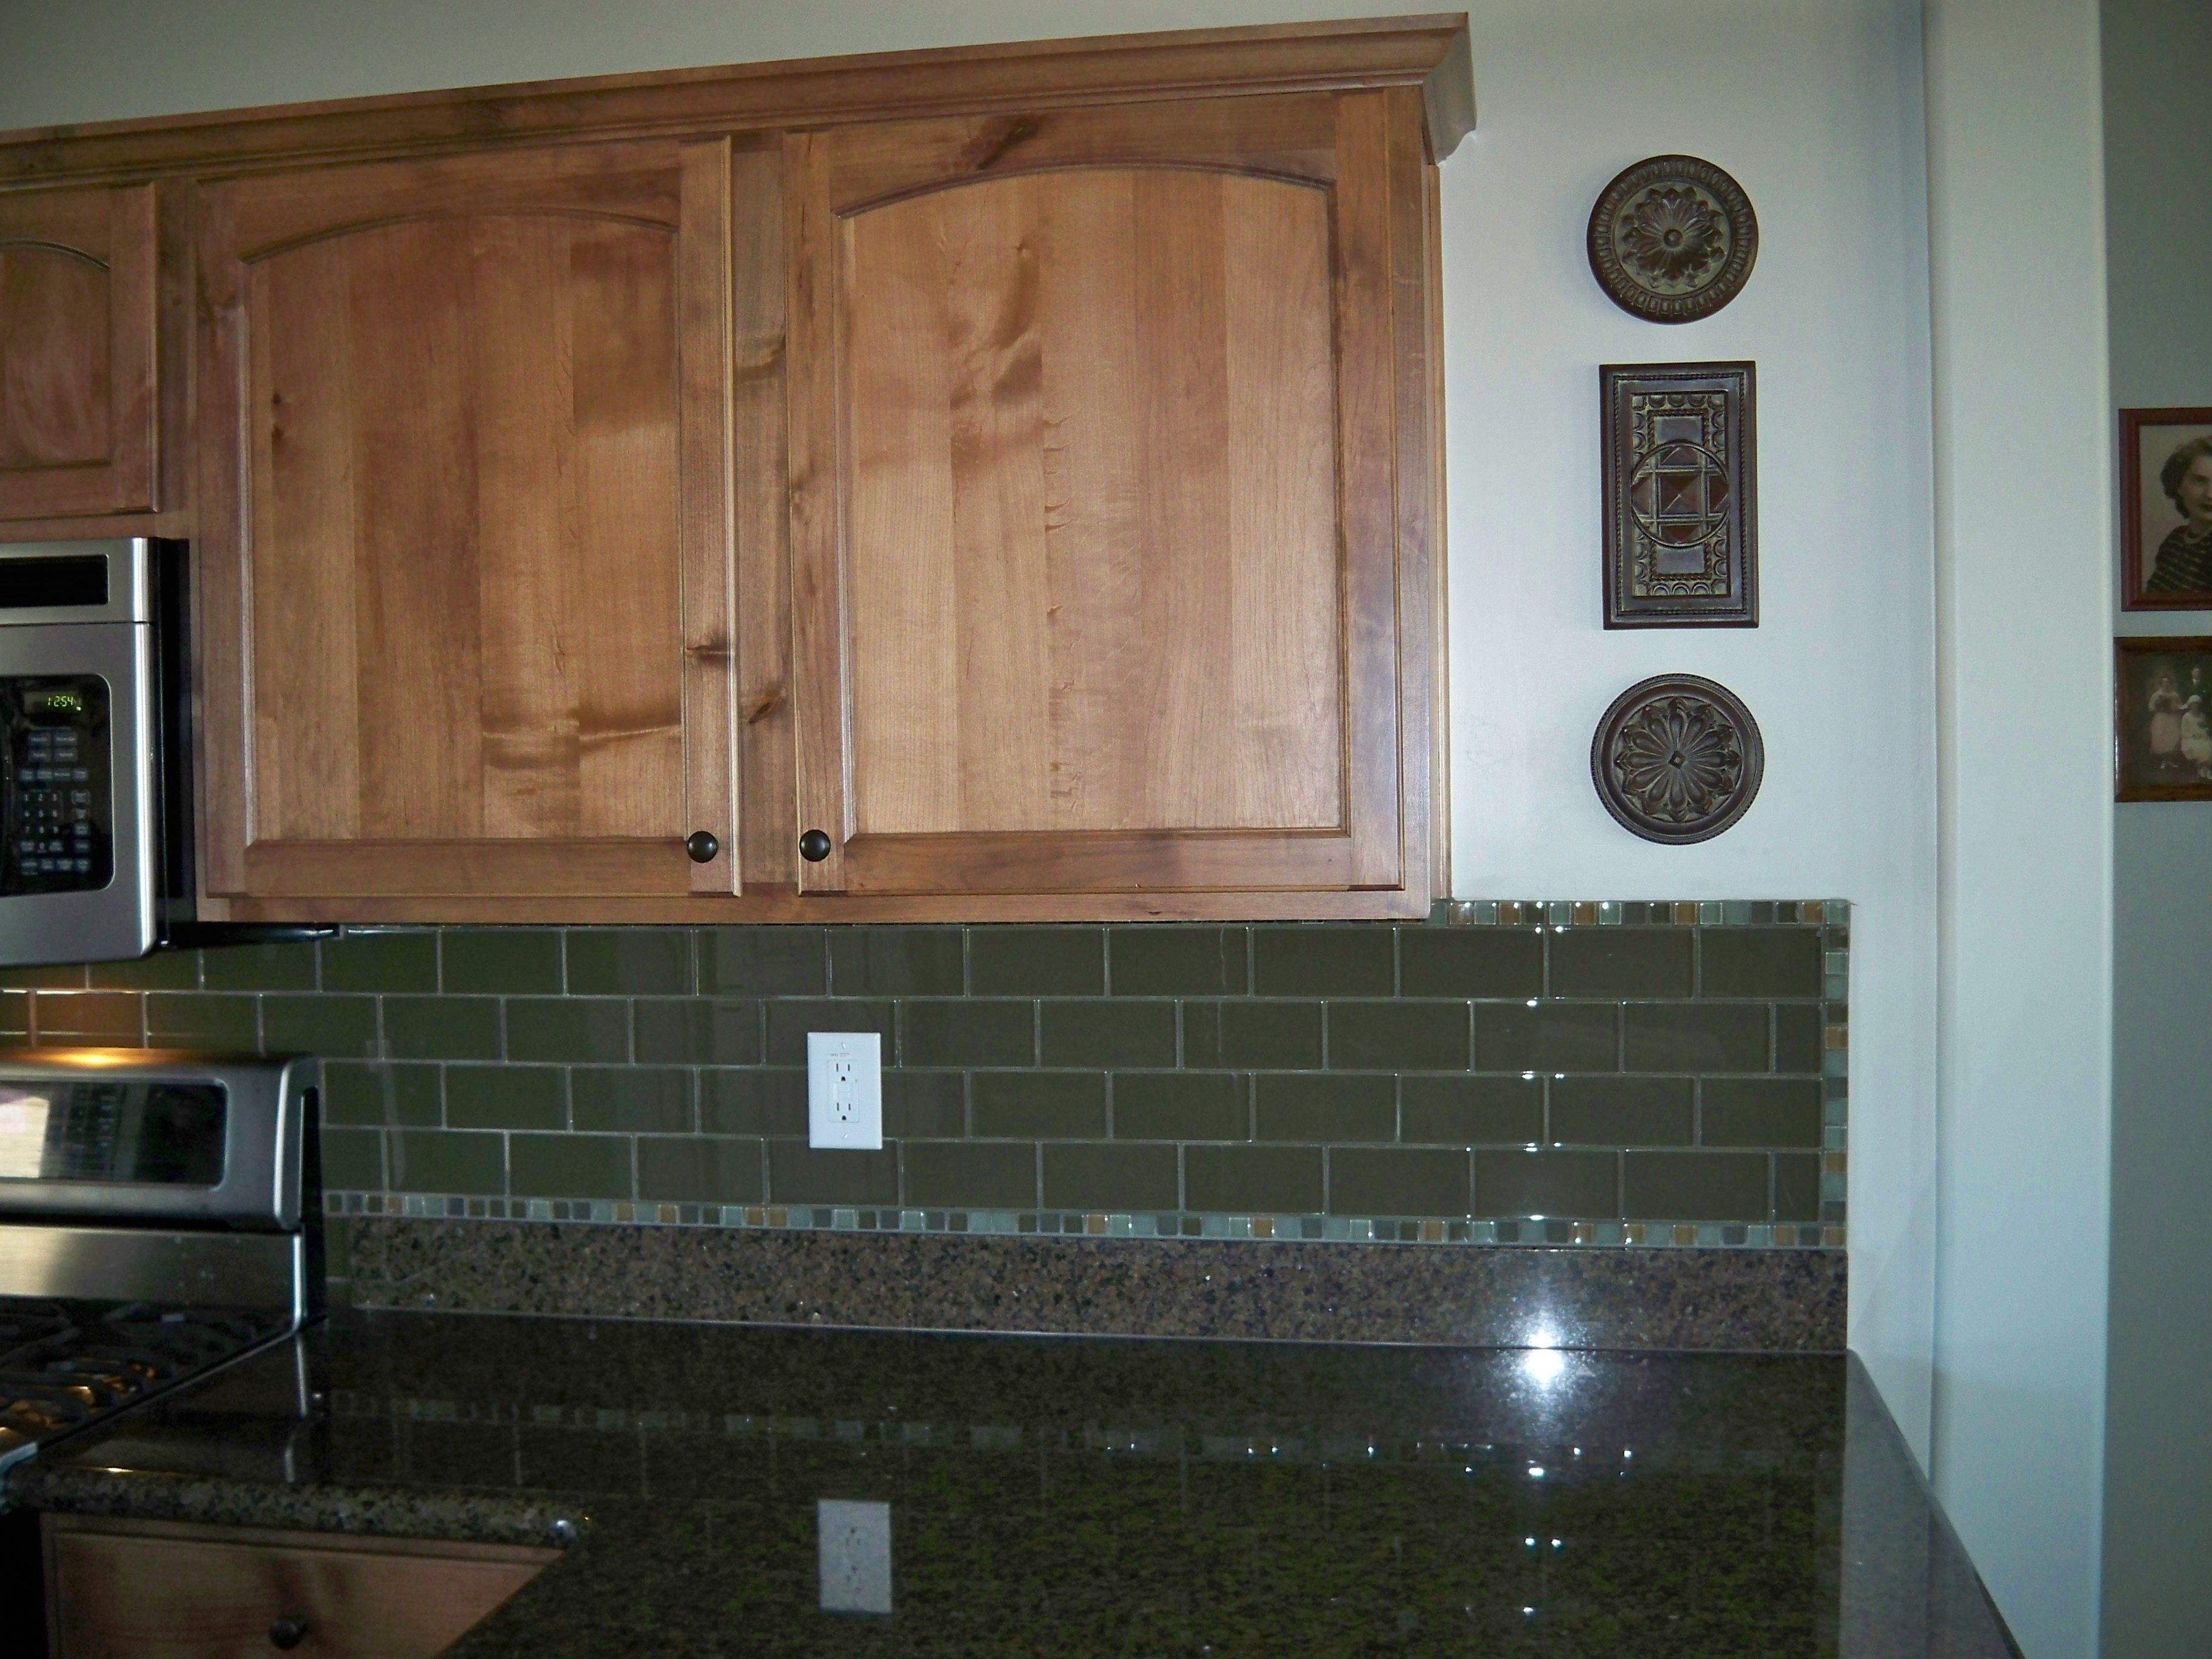 Glass tile kitchen backsplash, Feb. 2013. By Mingus Tile